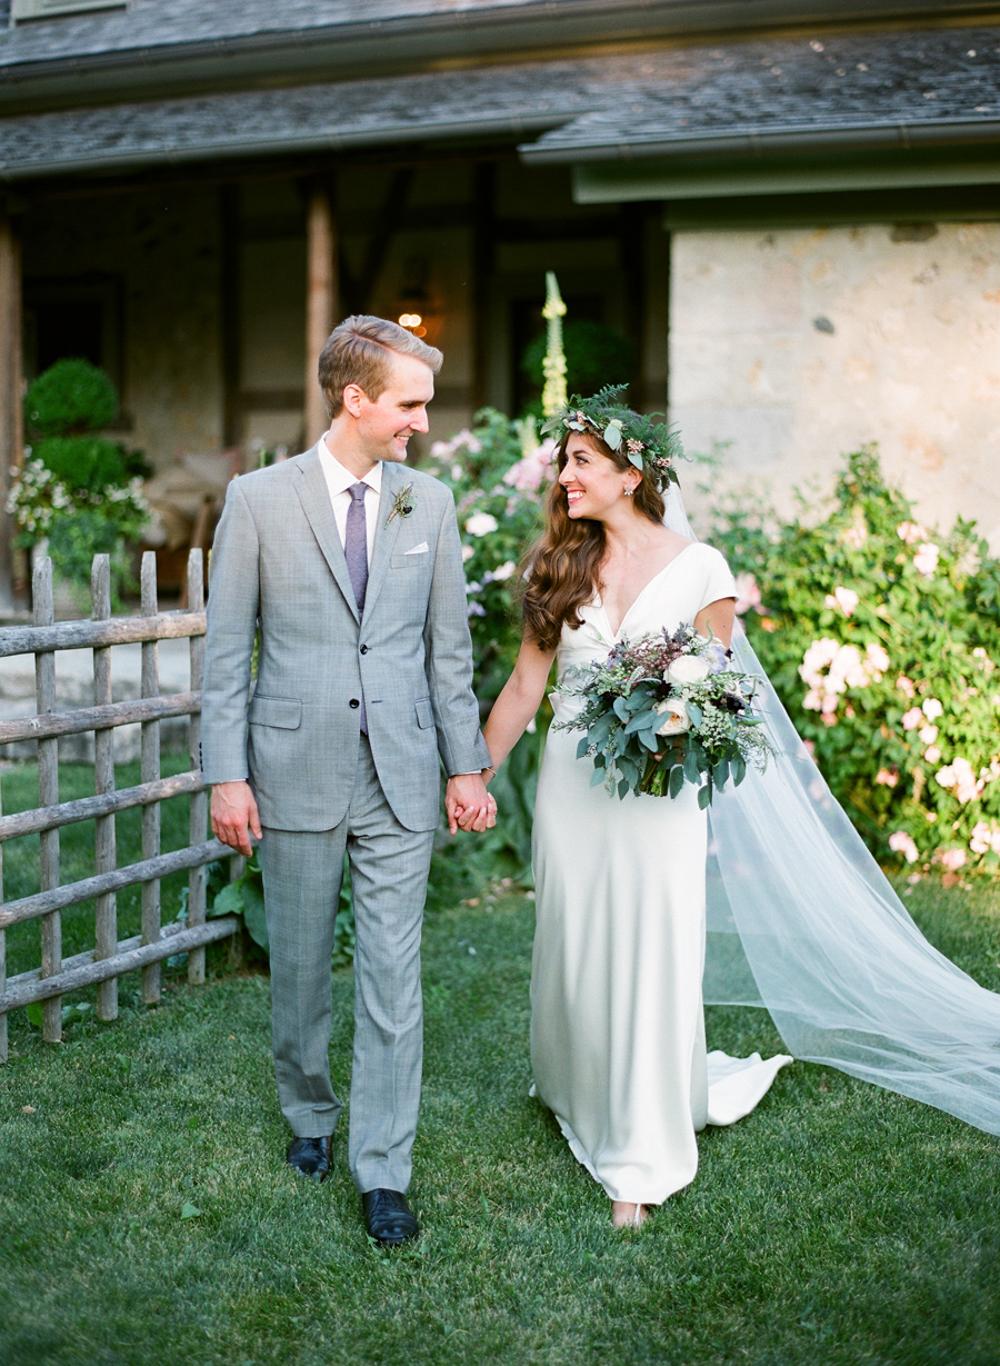 Ramhorn_Farm_Wedding_Photos_028.jpg